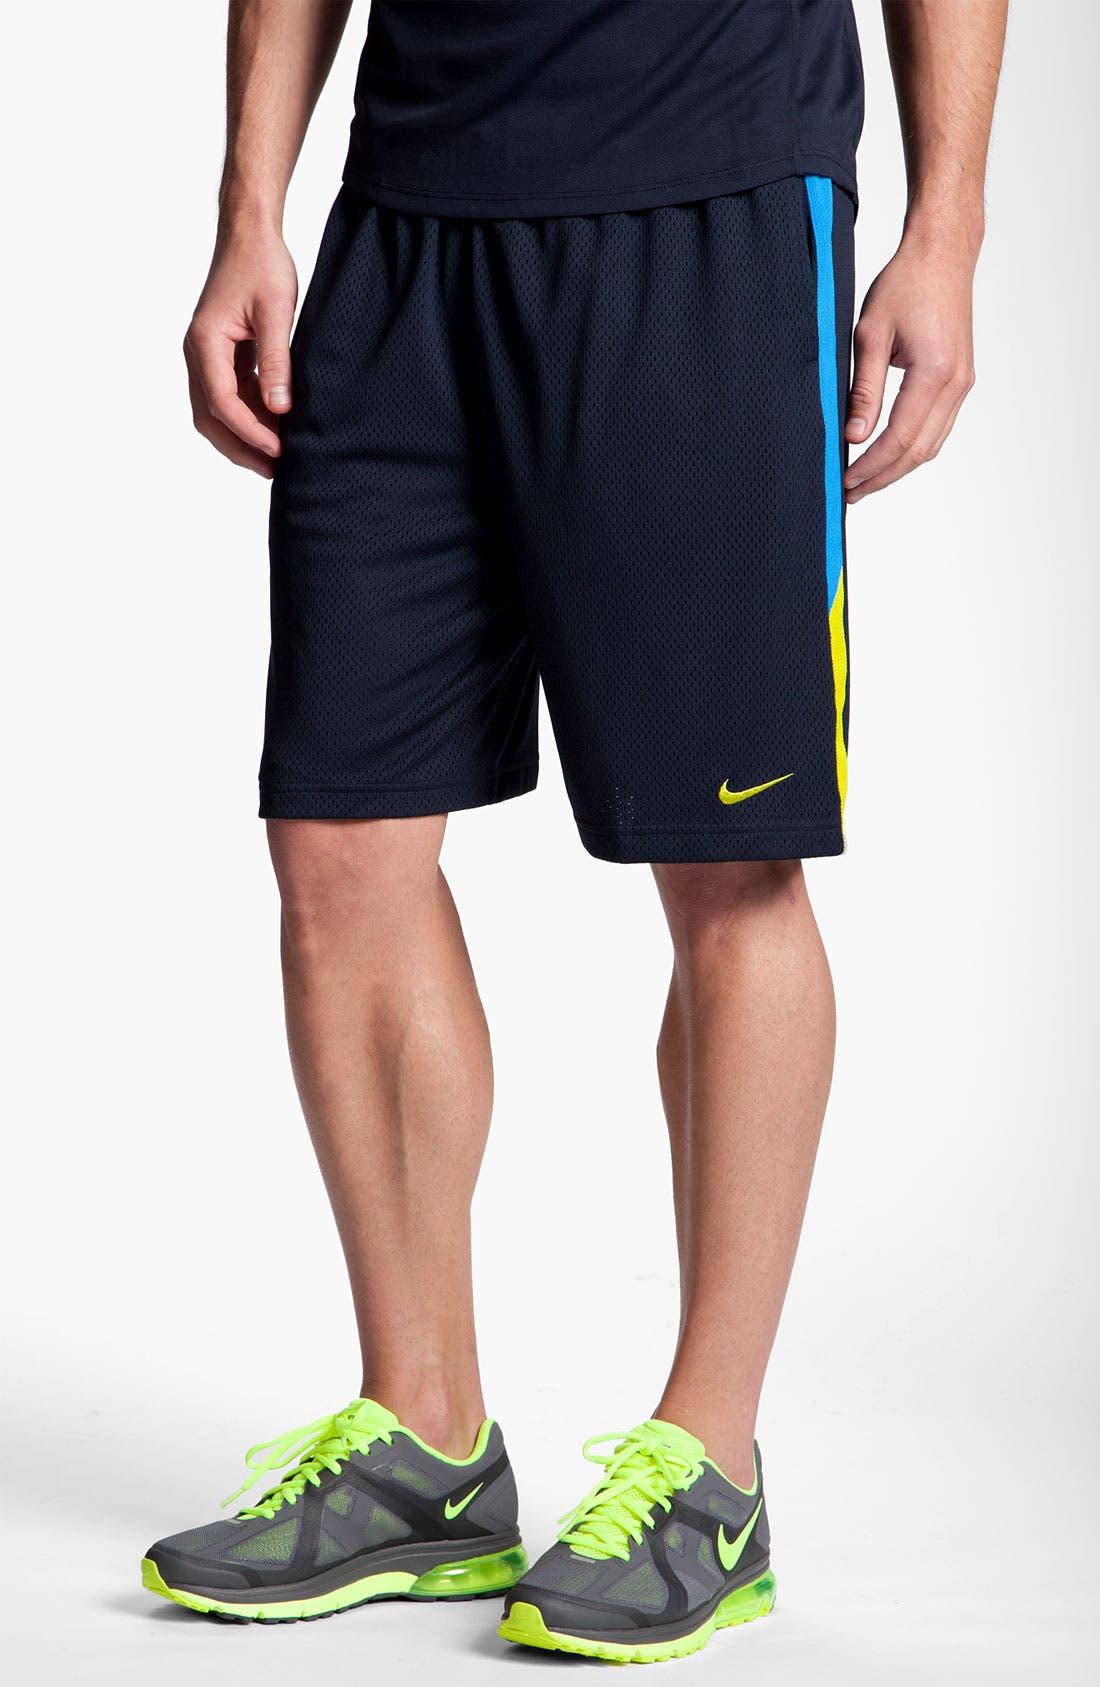 Alternate Image 1 Selected - Nike 'Monster' Dri-FIT Shorts